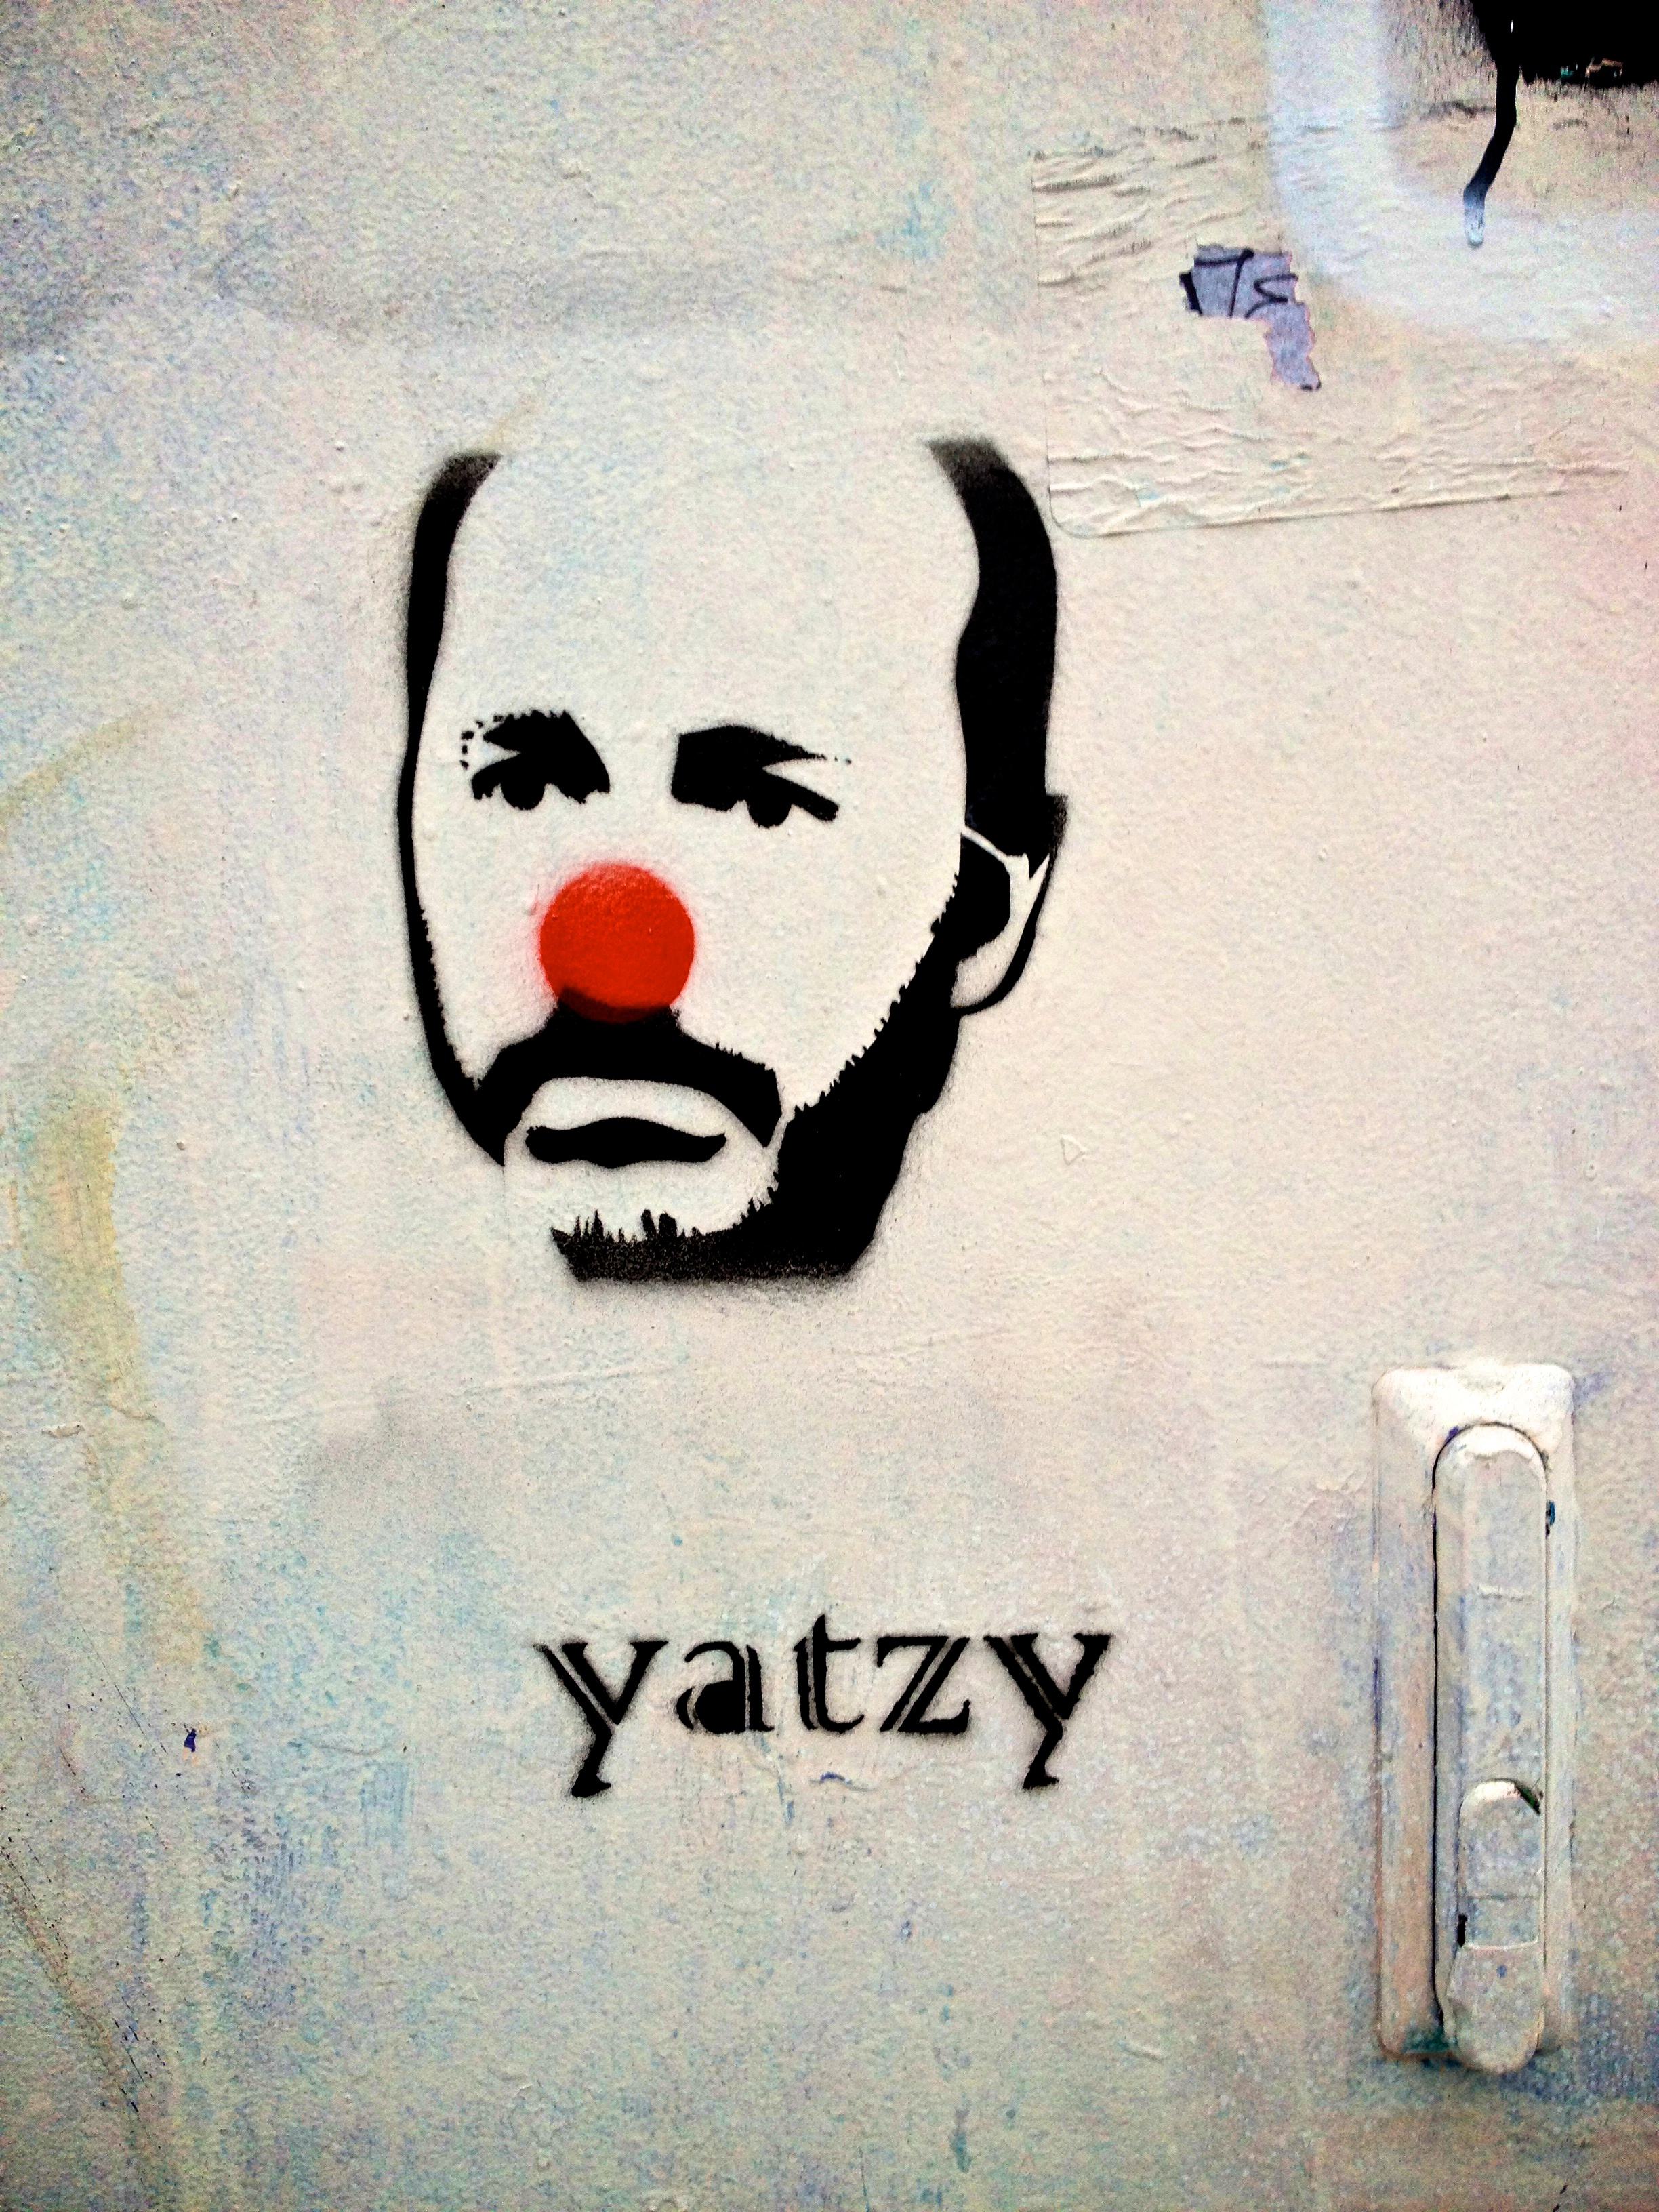 yatzy6.jpg